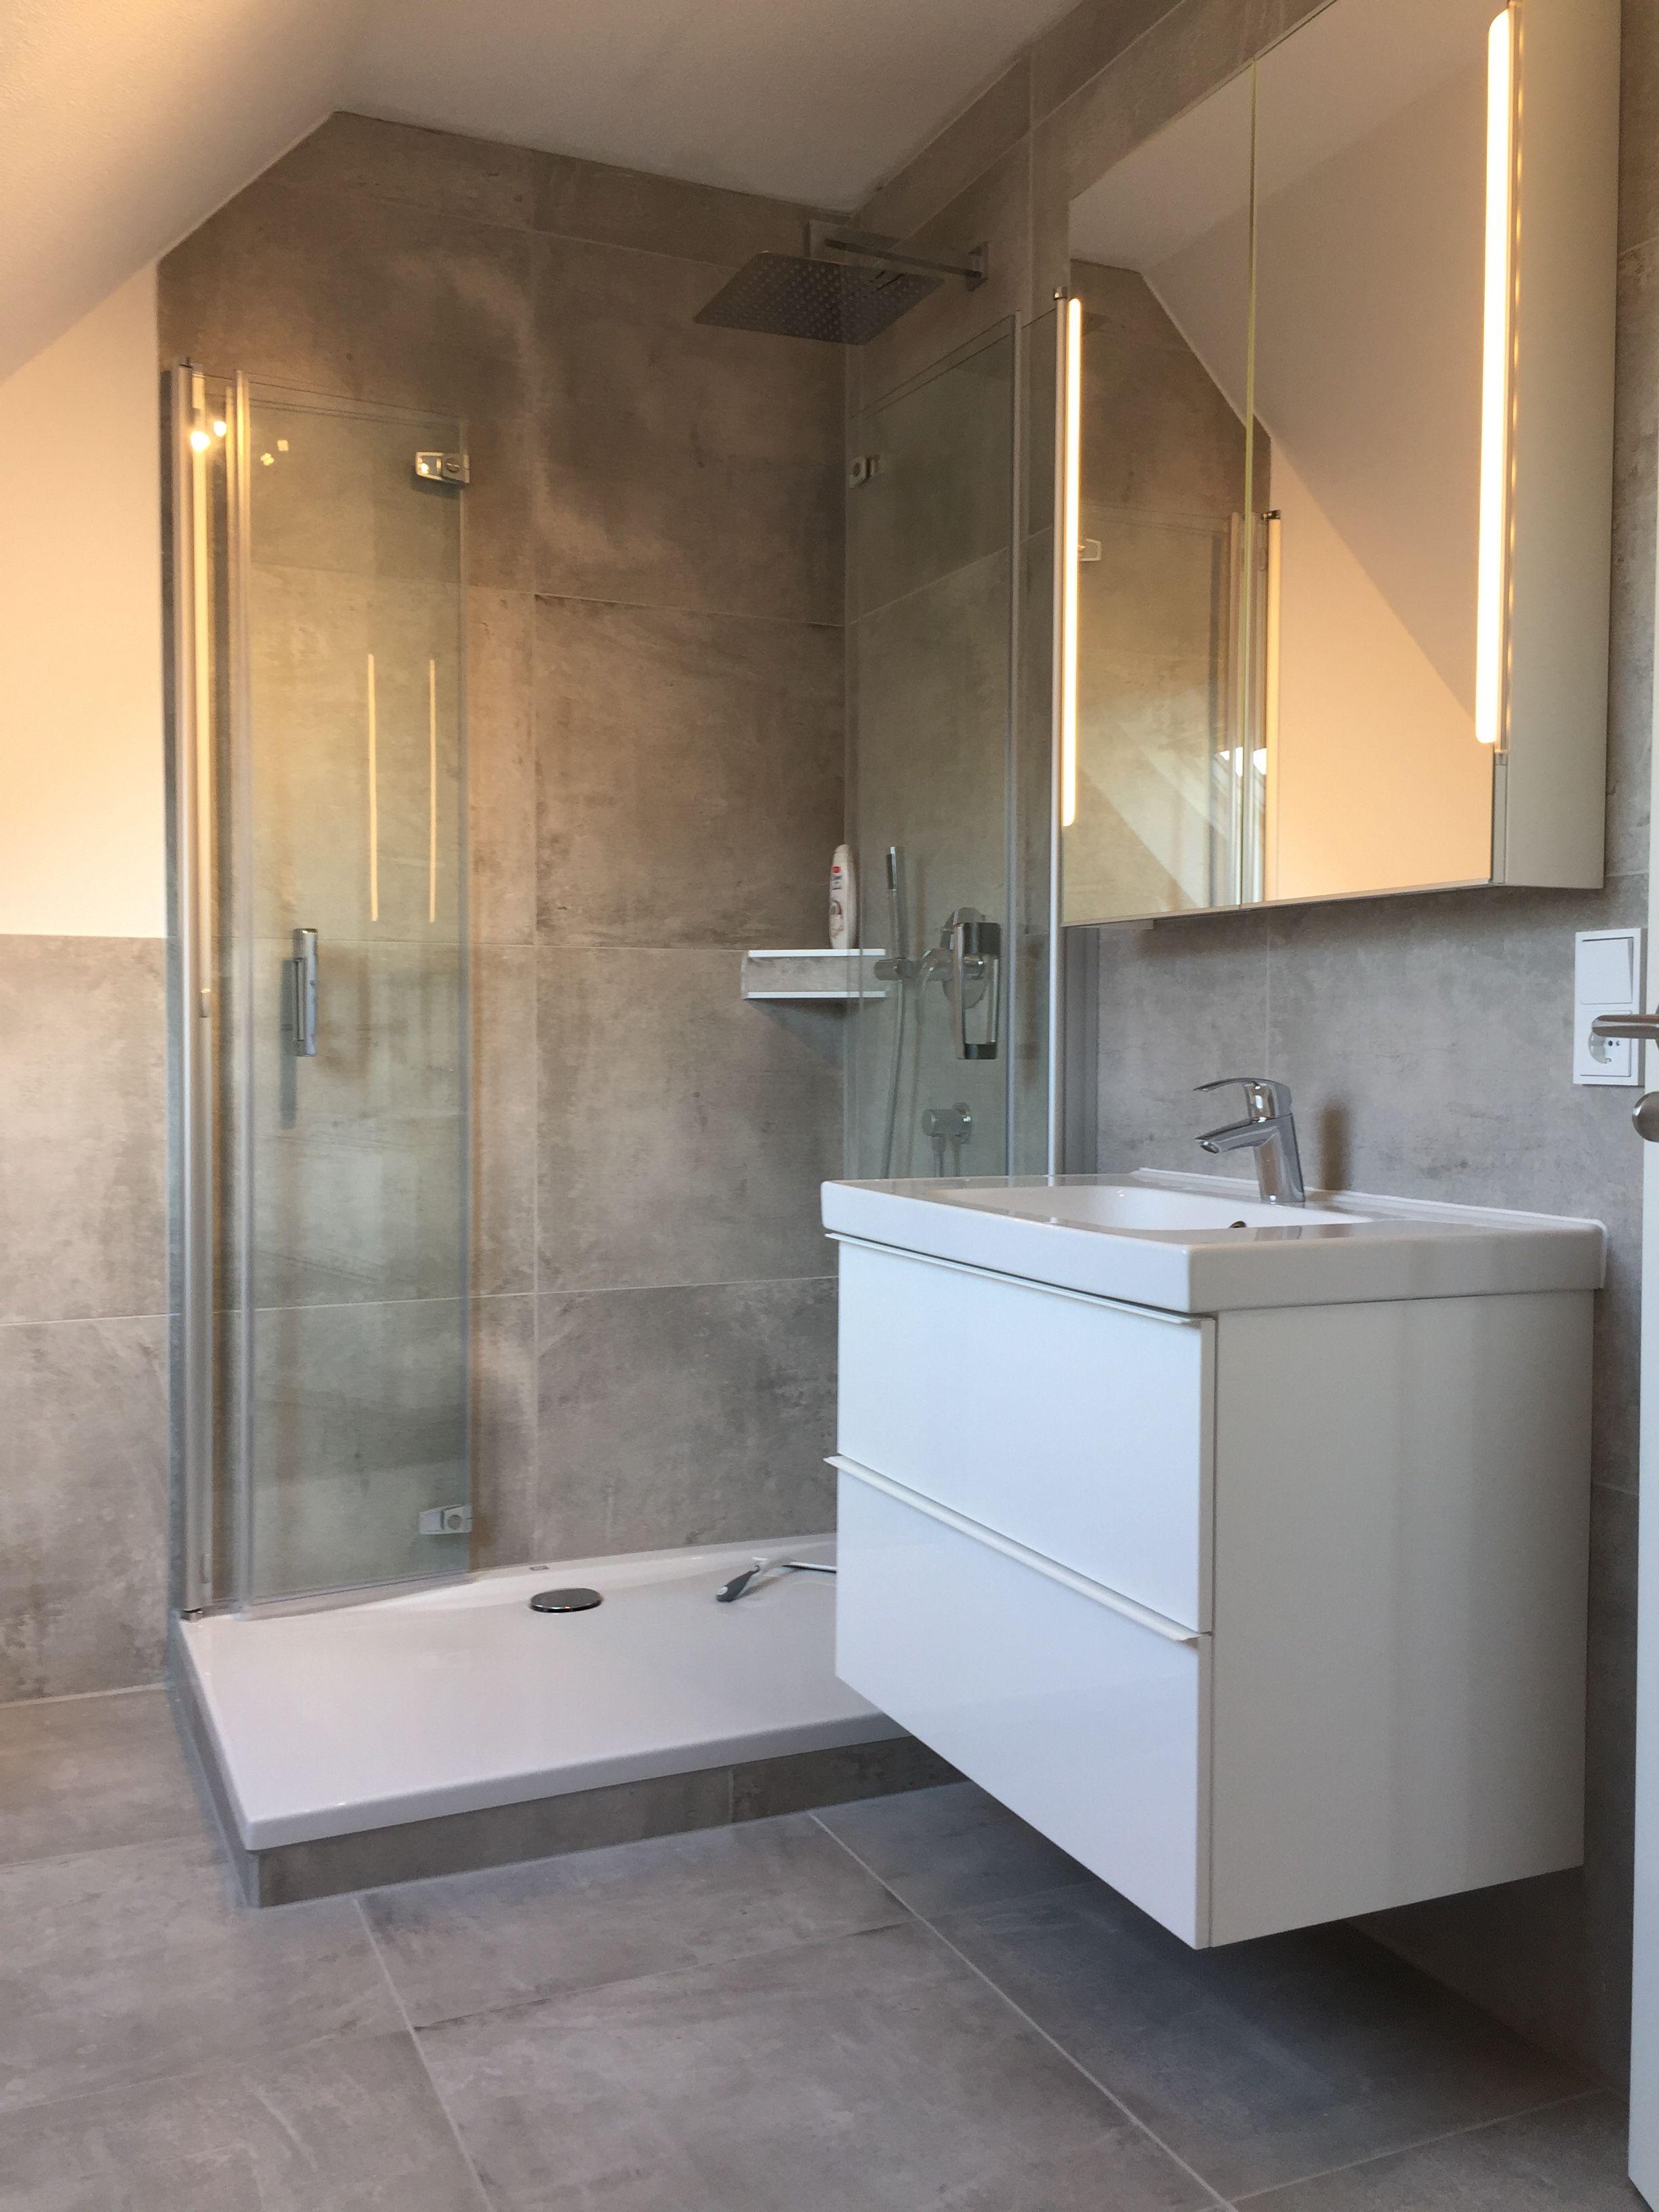 Ikea Badmobel R F Duschwanne Grohe Armaturen Betonoptik Fliesen Aqua Bathroom Lighted Bathroom Mirror Bathroom Mirror